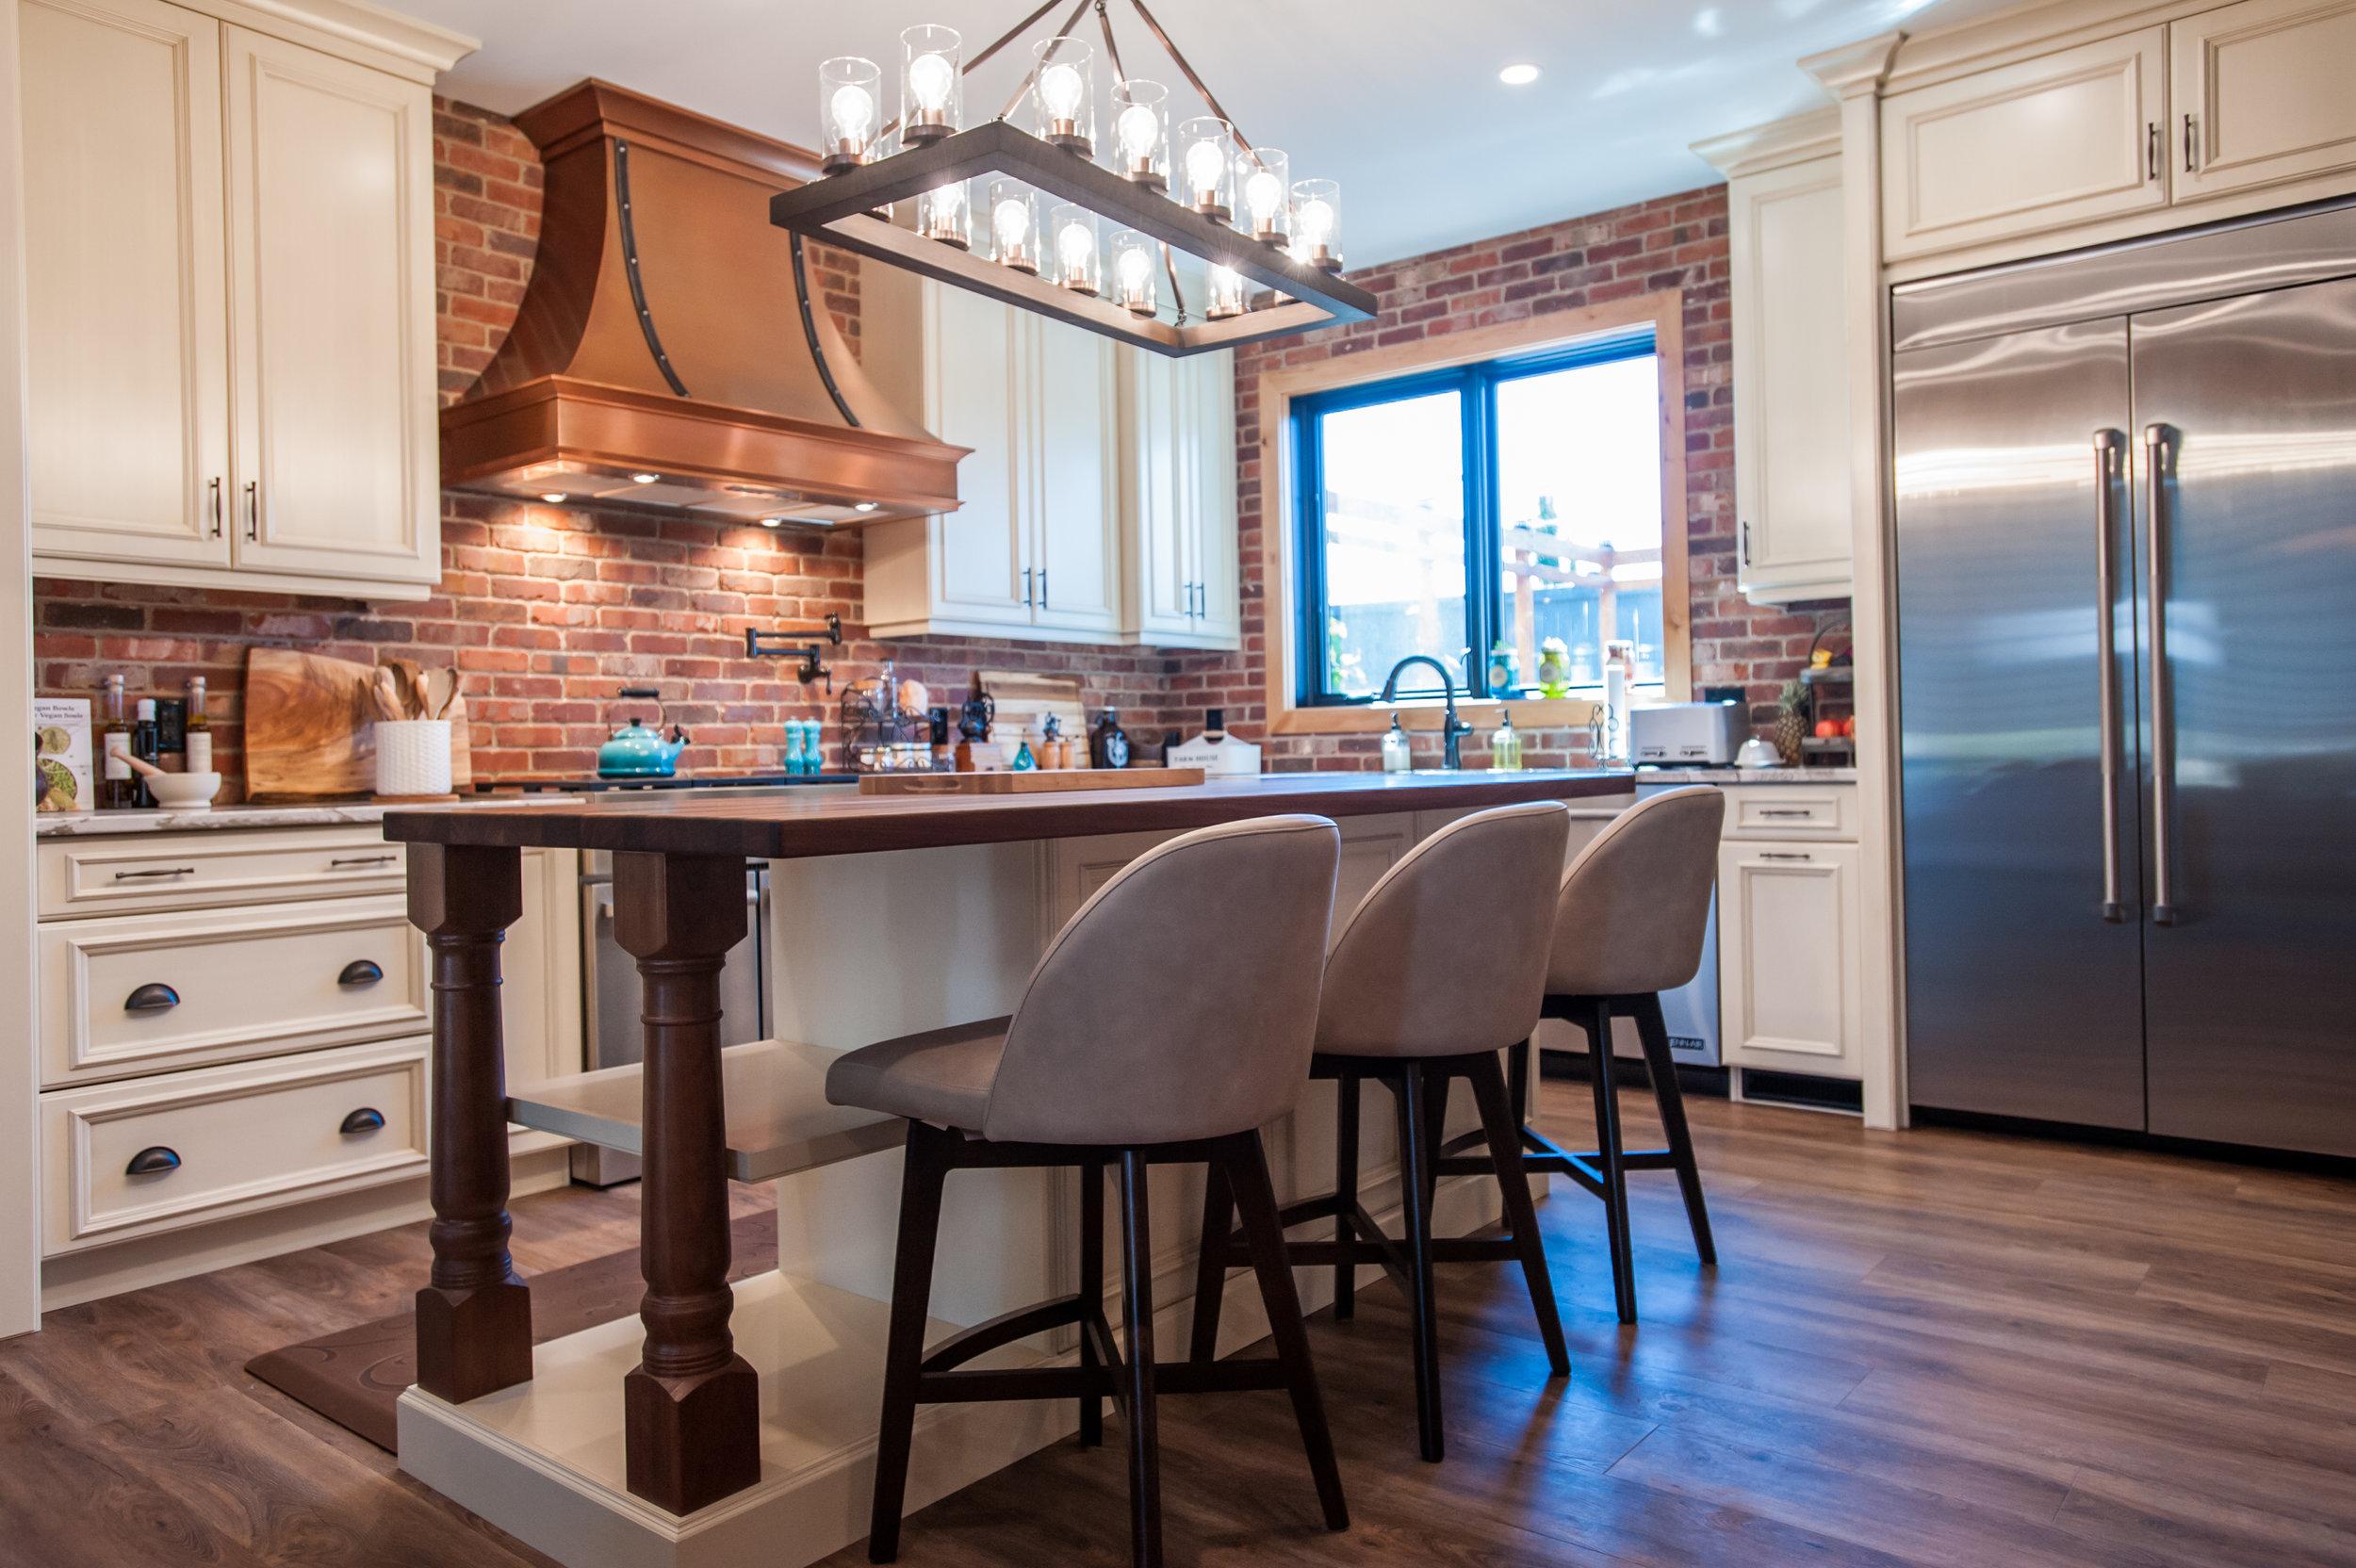 Rustic_kitchen_copper_hoodvent